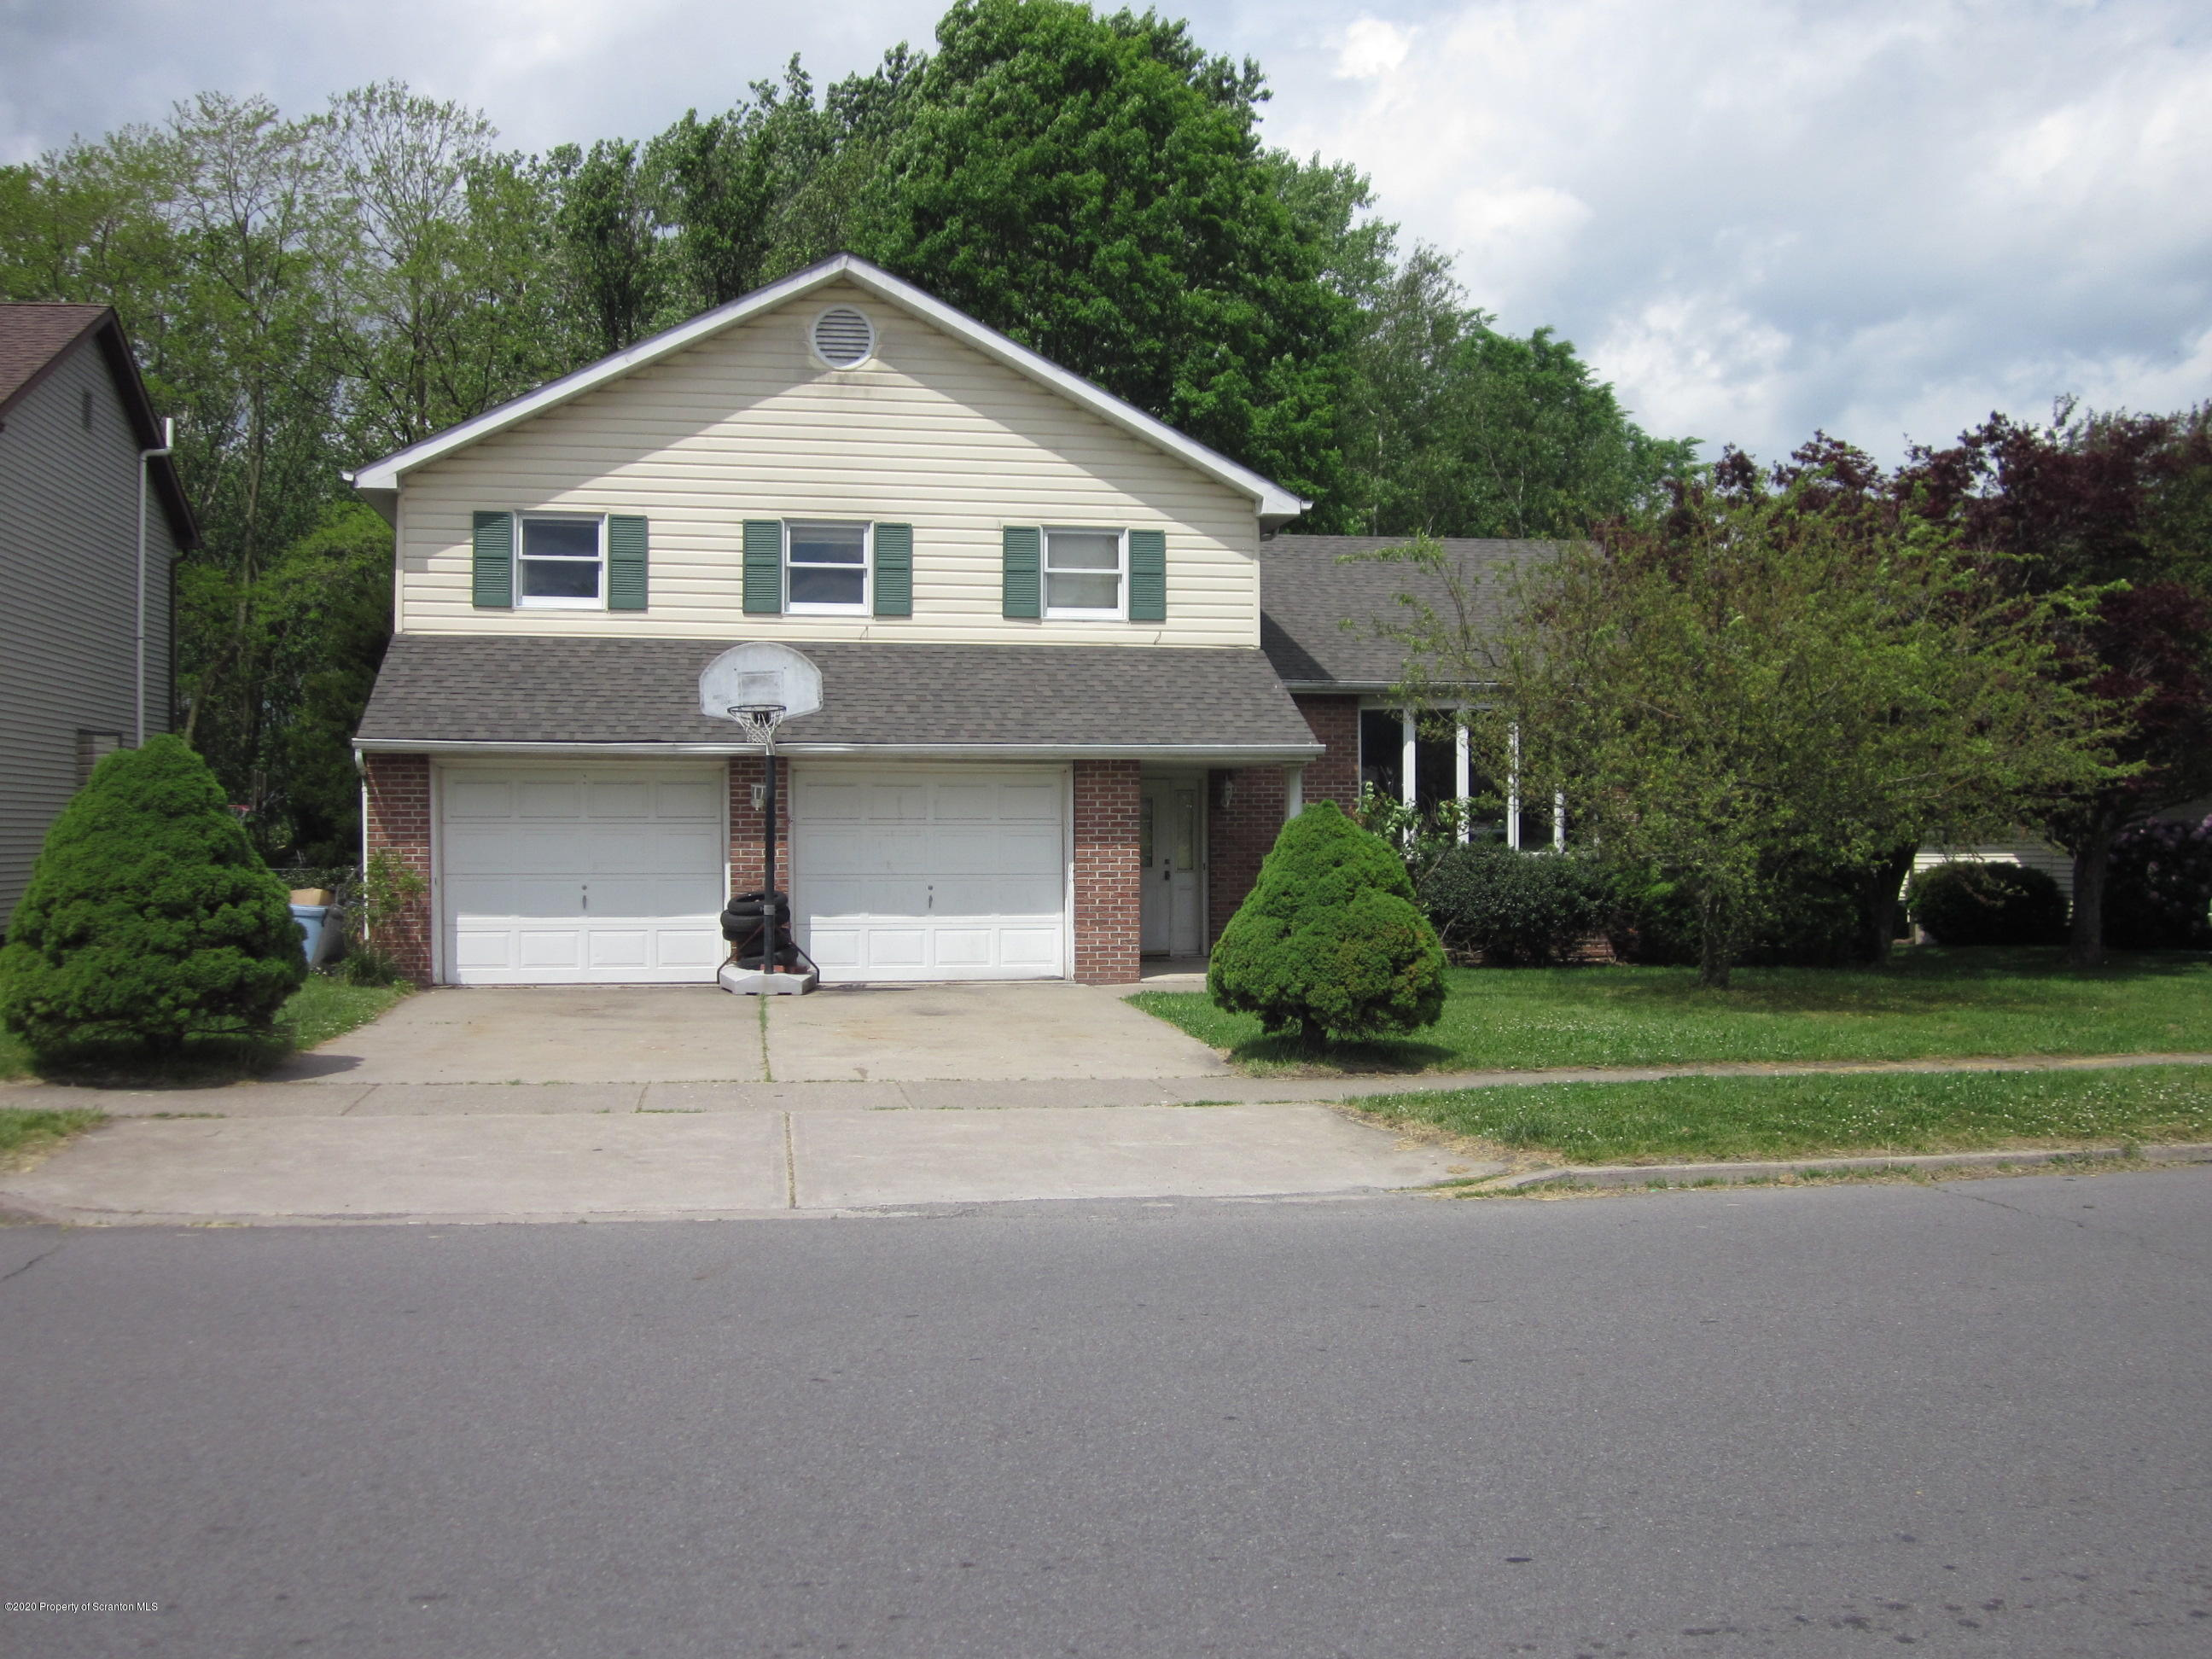 706 Parrott Avenue, Scranton, Pennsylvania 18504, 3 Bedrooms Bedrooms, 7 Rooms Rooms,3 BathroomsBathrooms,Single Family,For Sale,Parrott,20-1776